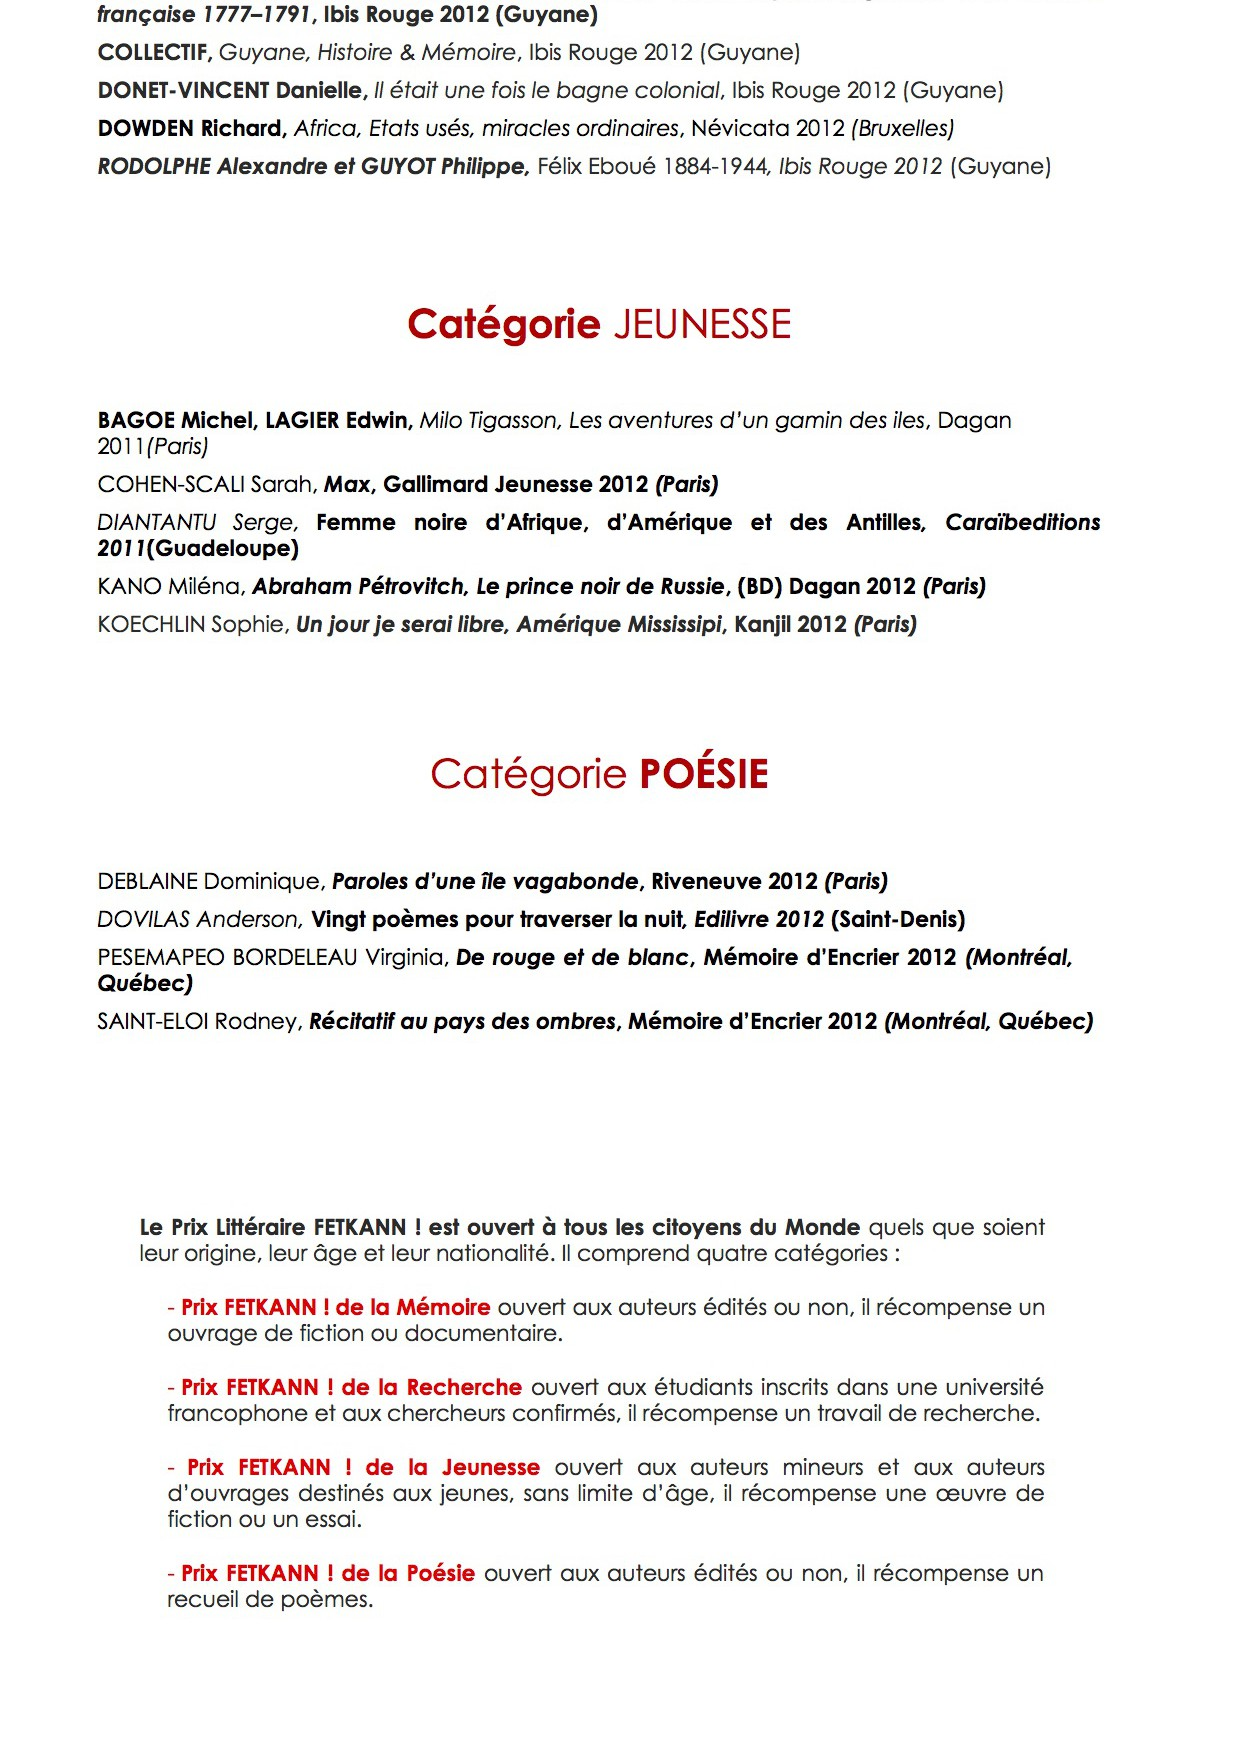 CP Prix_FETKANN_Pressentis 2012-2